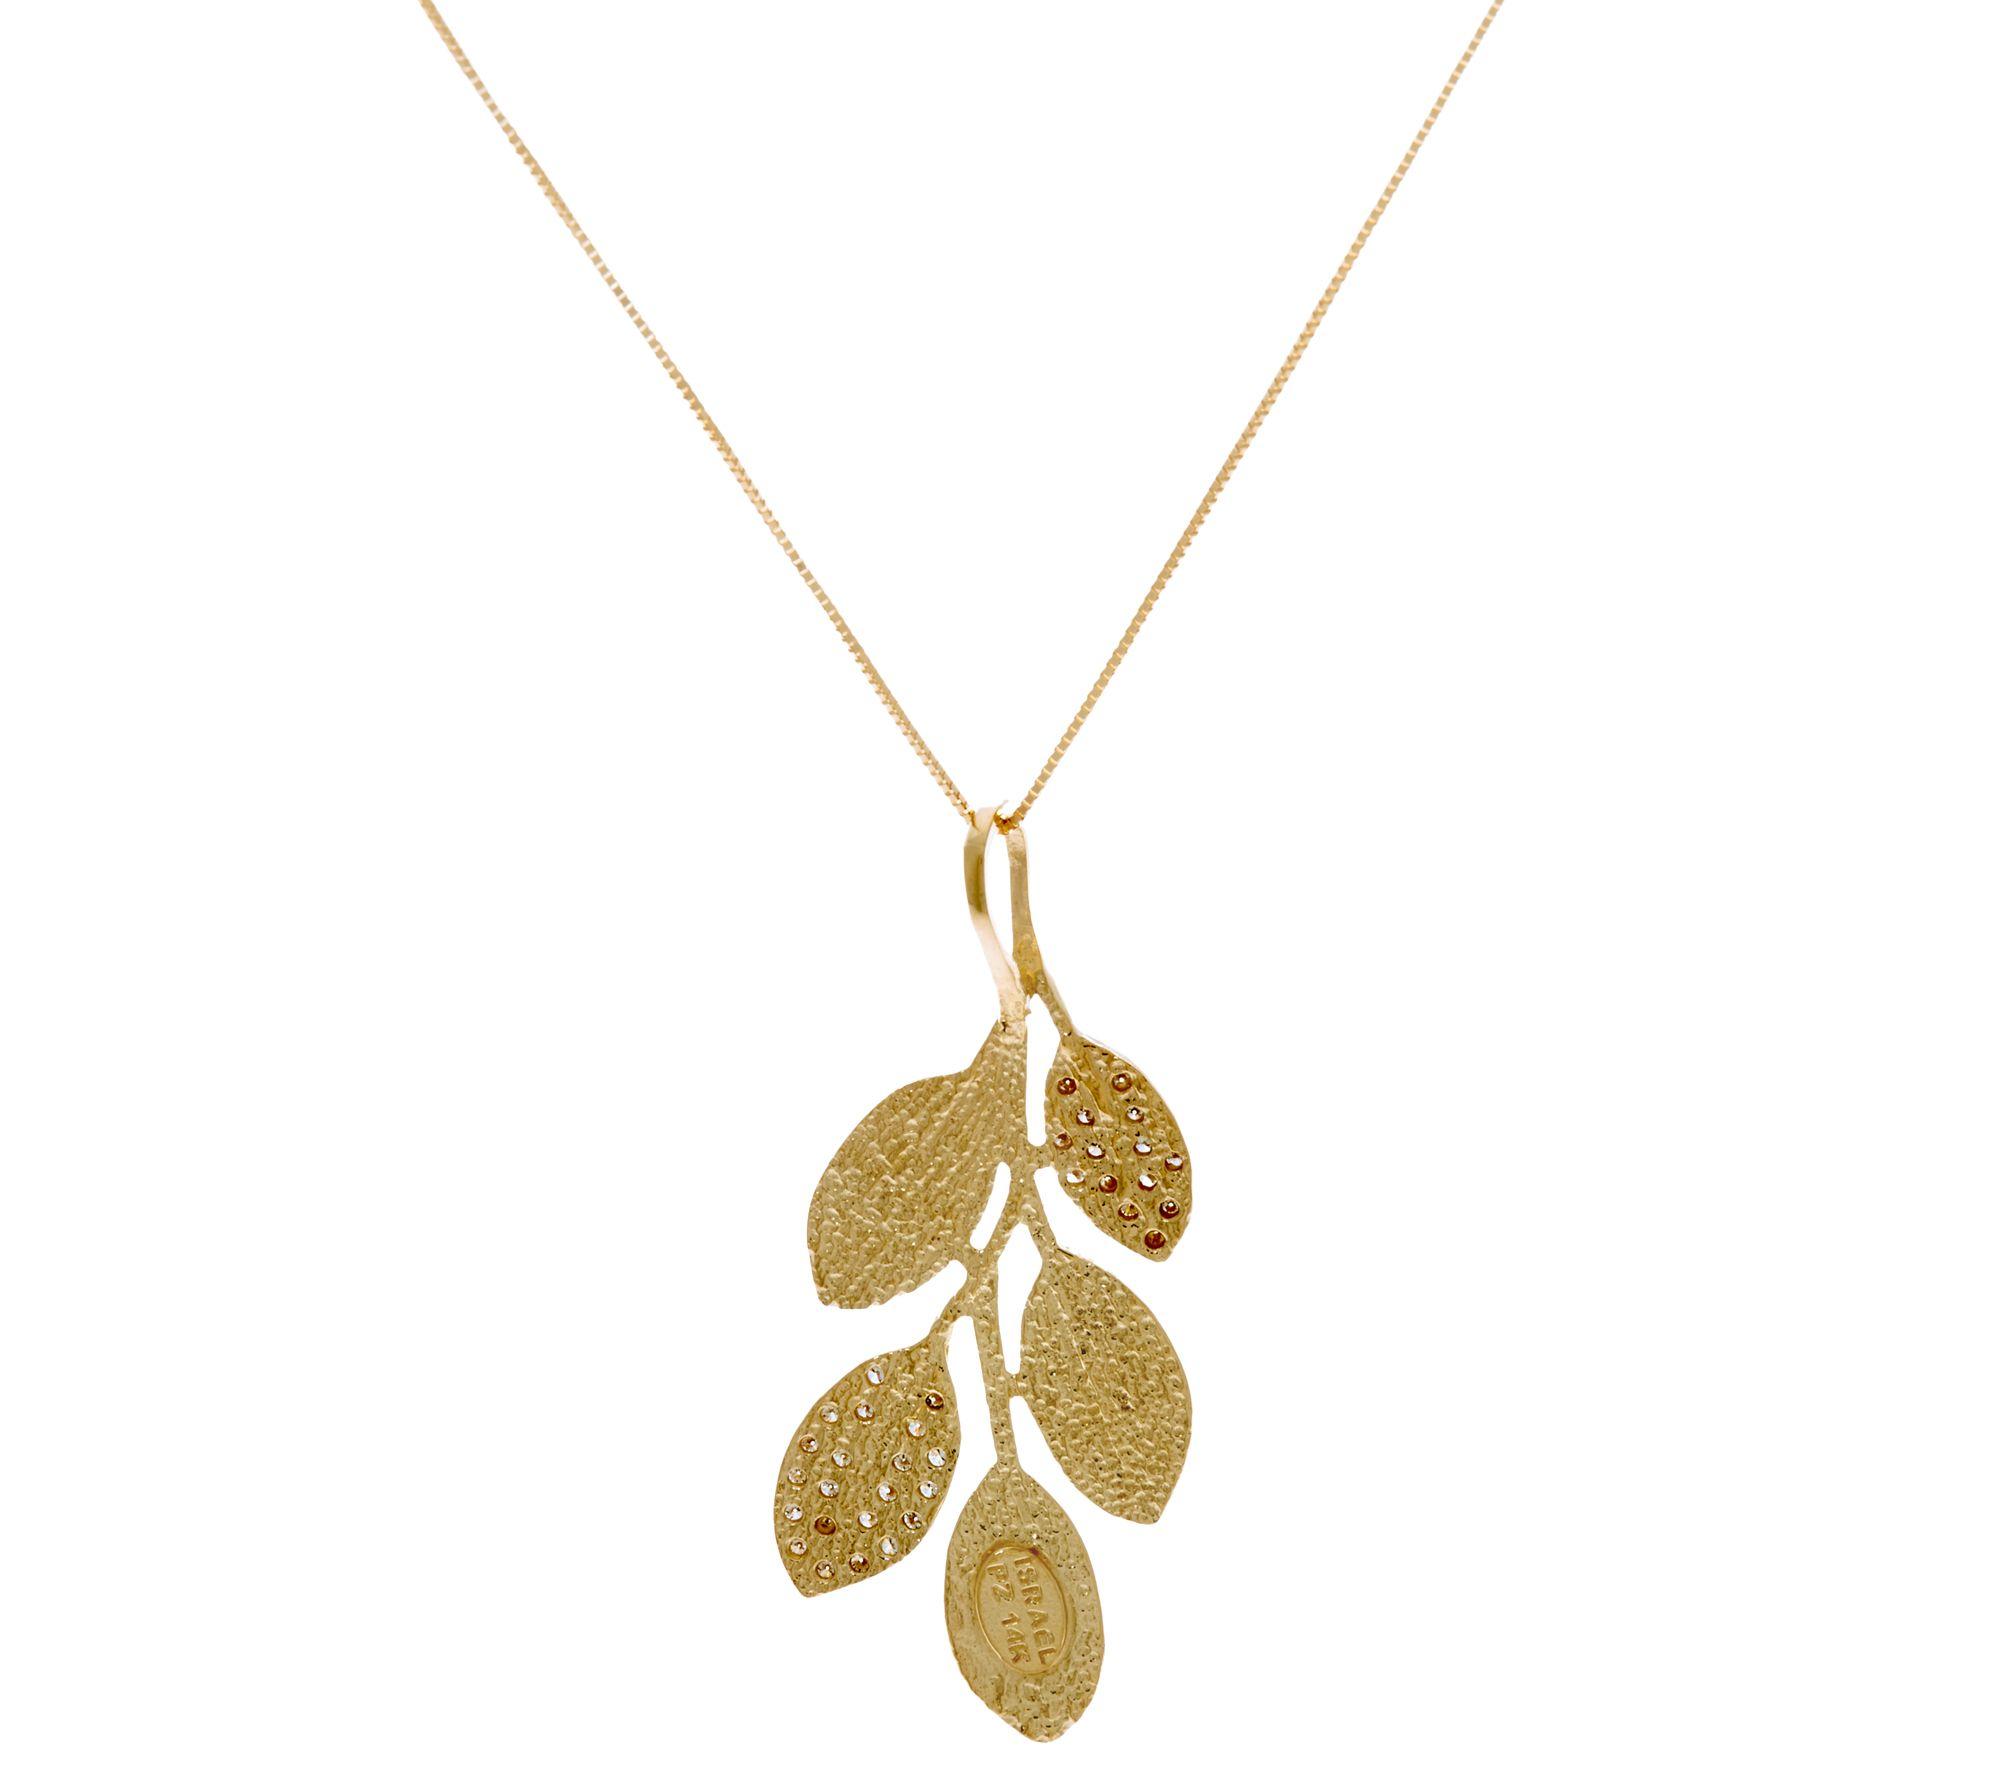 Adi Paz 1 5 cttw Diamond & 14K Gold Leaf Pendant with Chain Page